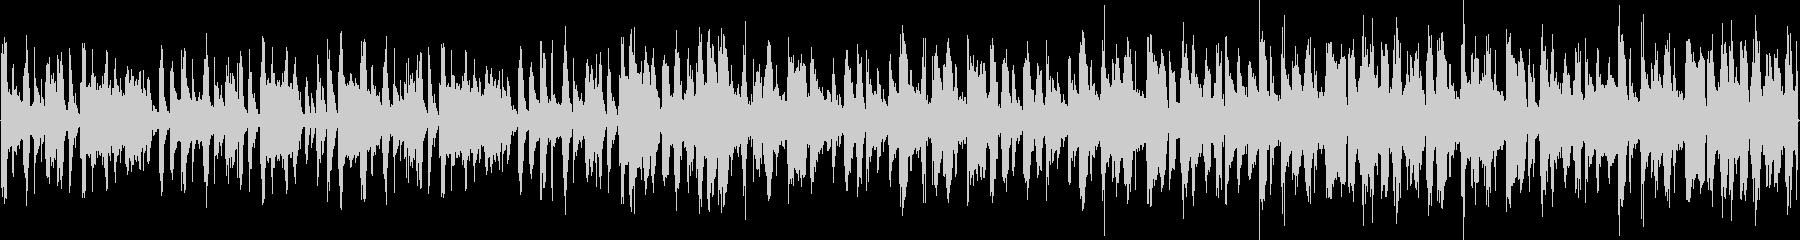 178bpm、Ab-Maj、ラテン調の未再生の波形